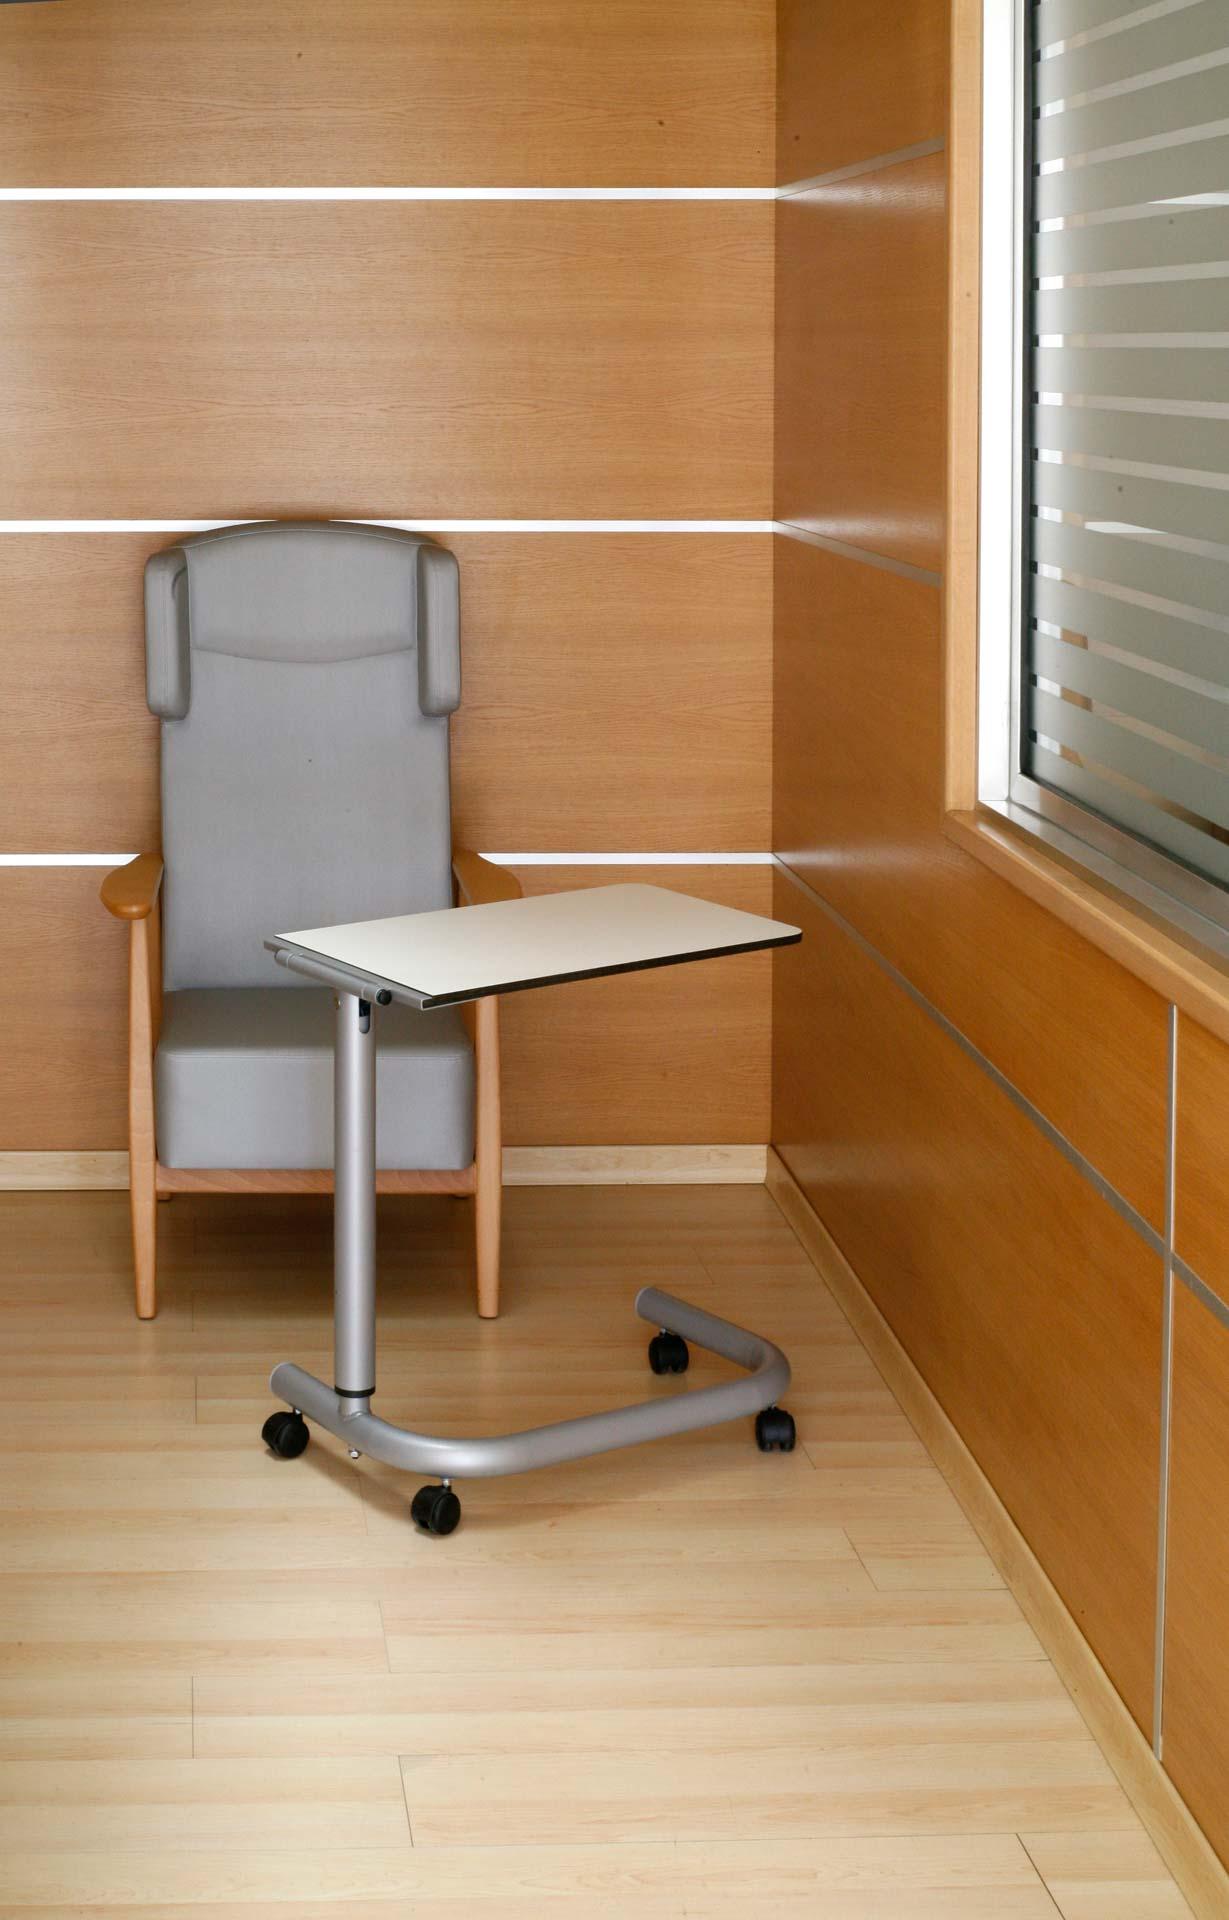 Mesa auxiliar para personas mayores de SENIORCARE